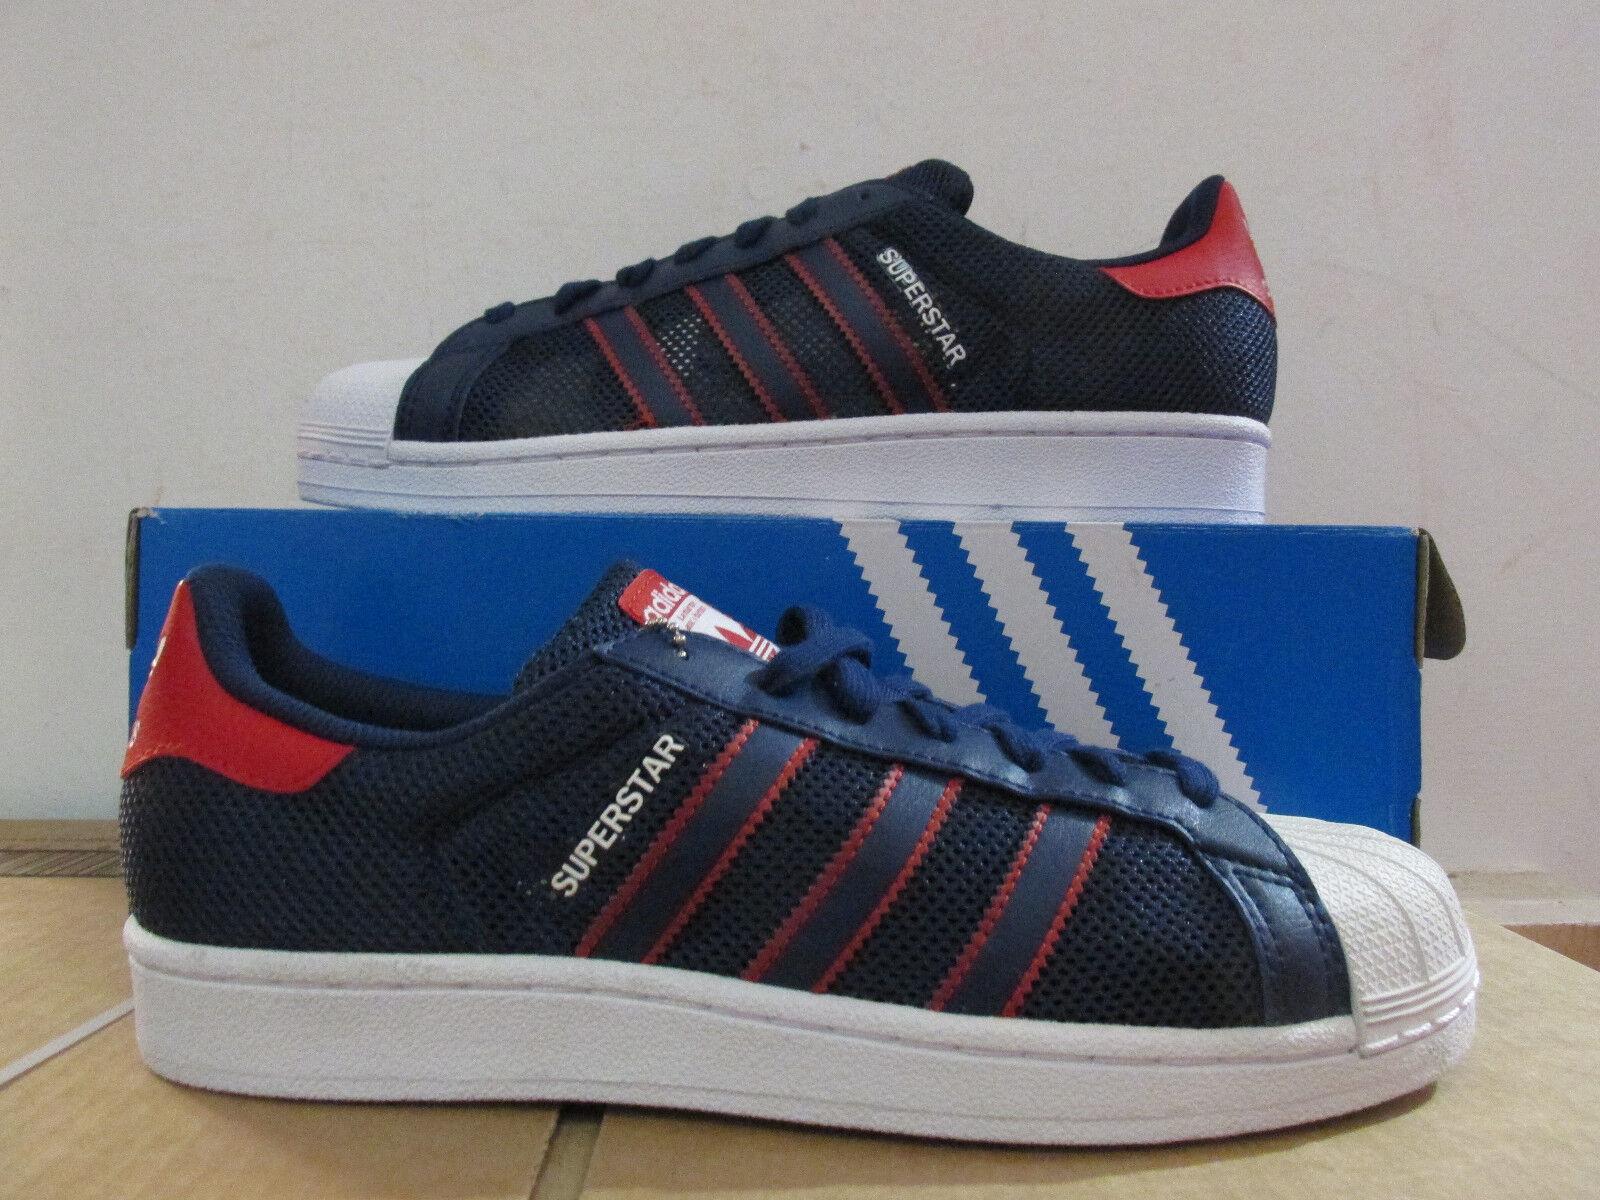 Adidas Original Superstar Herren Turnschuhe BB5395 Turnschuhe Ausverkauf